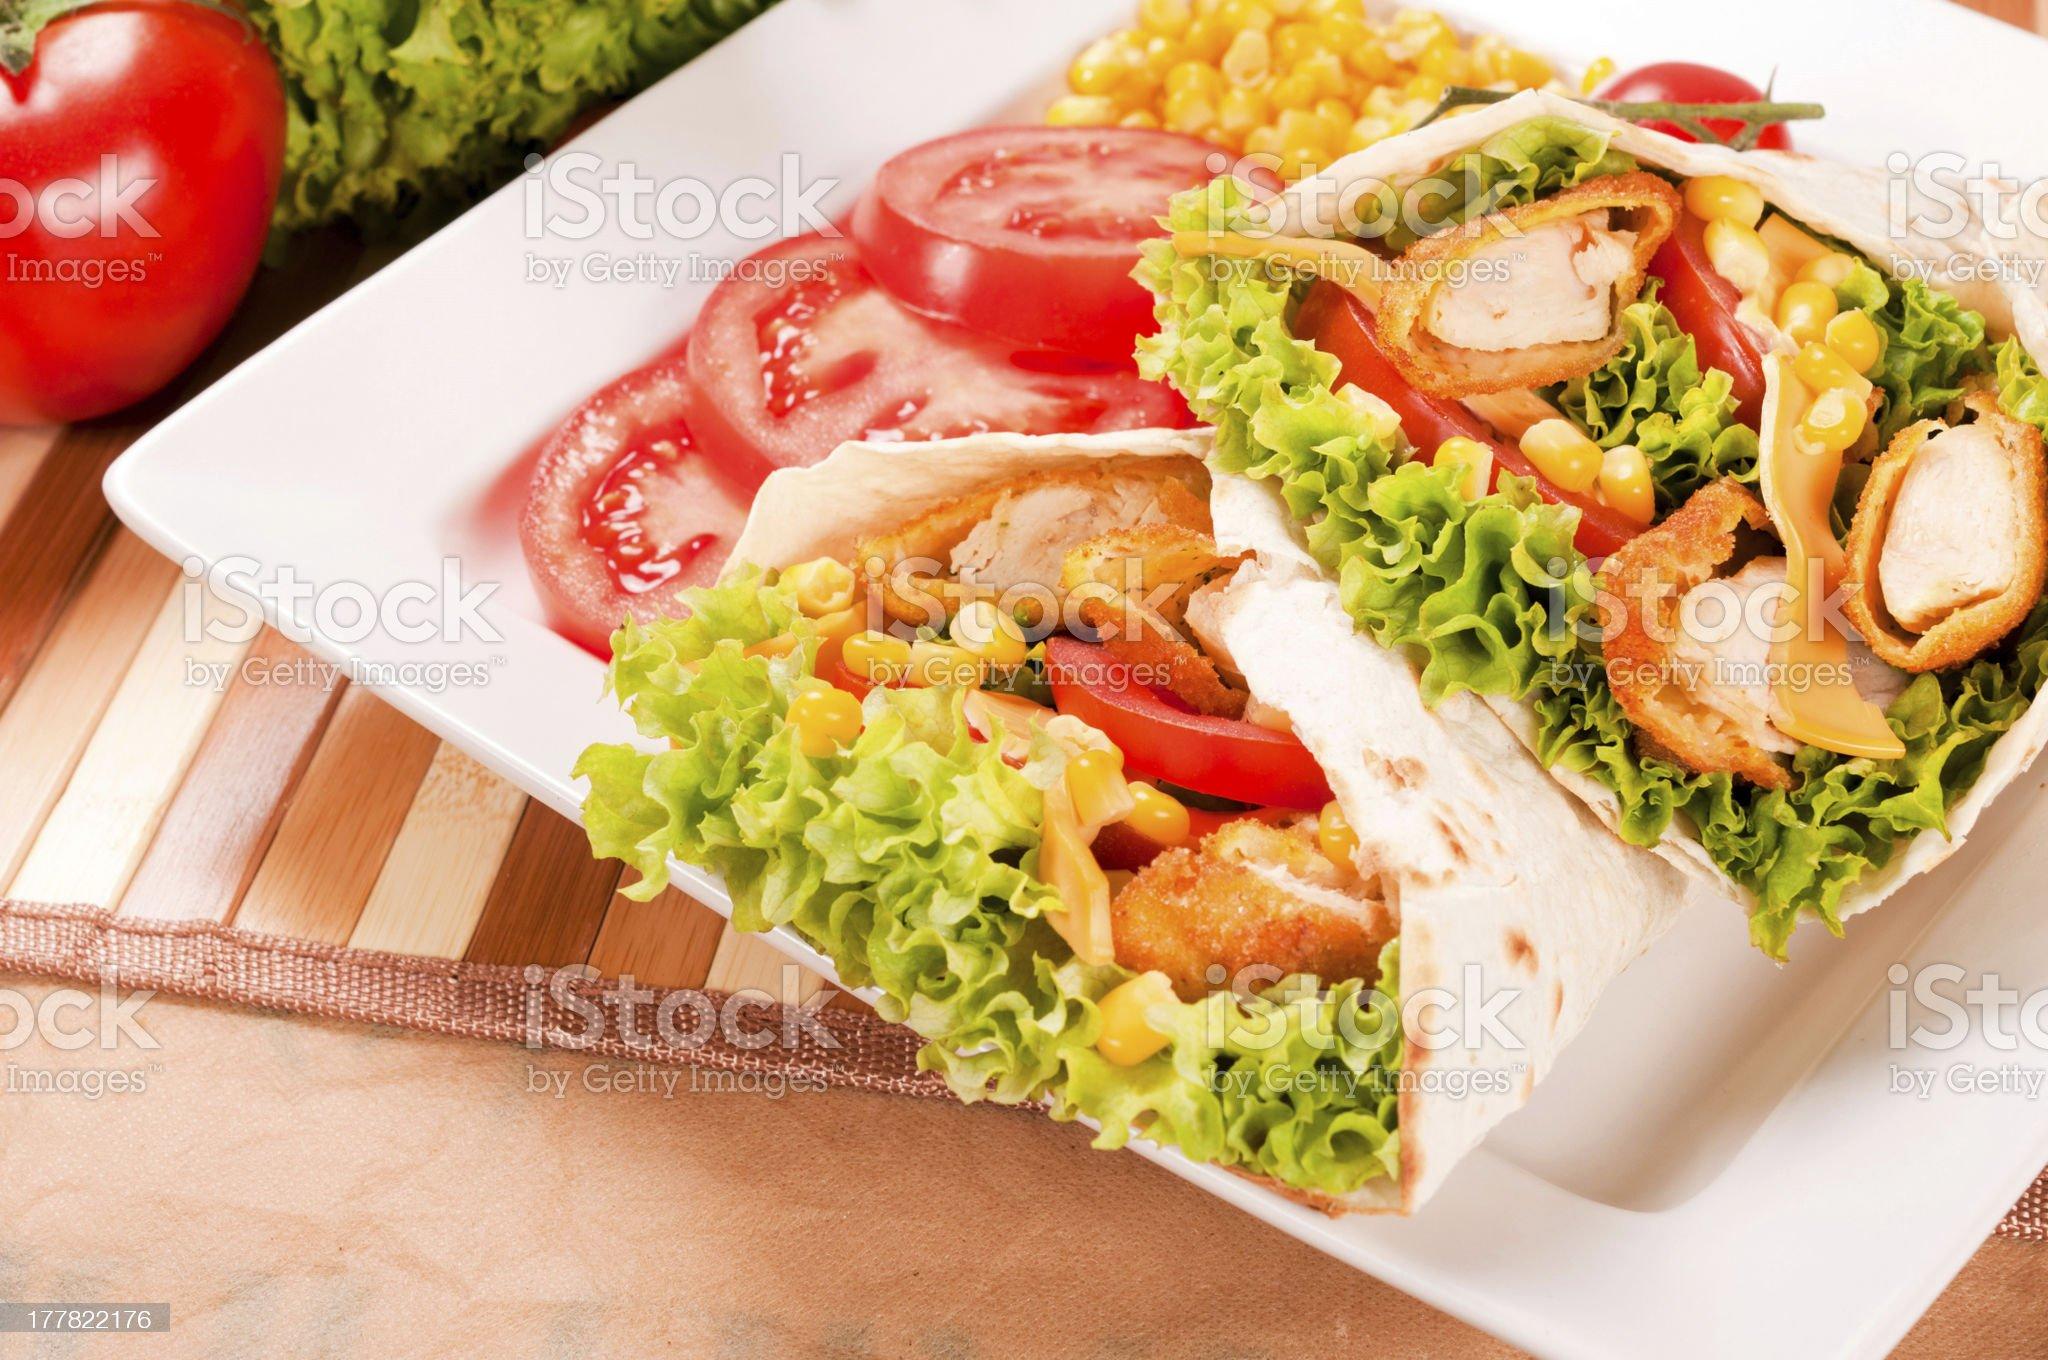 Tasty chicken wrap royalty-free stock photo